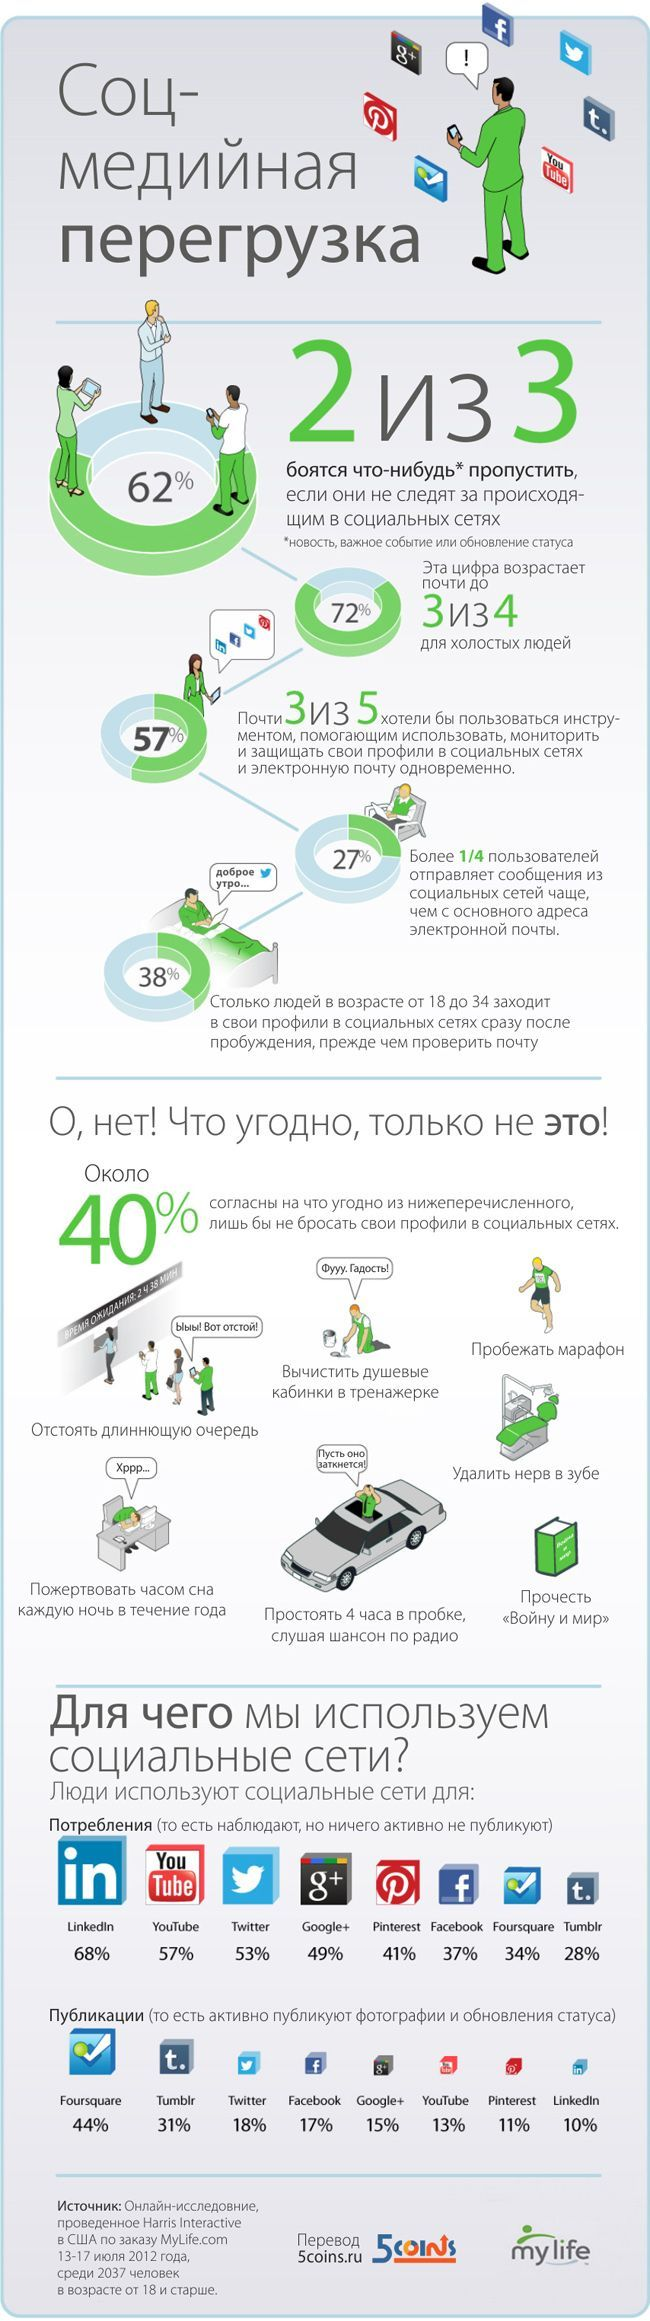 http://statictab.com/yxxo9wo #SOCIAL MEDIA перегрузка